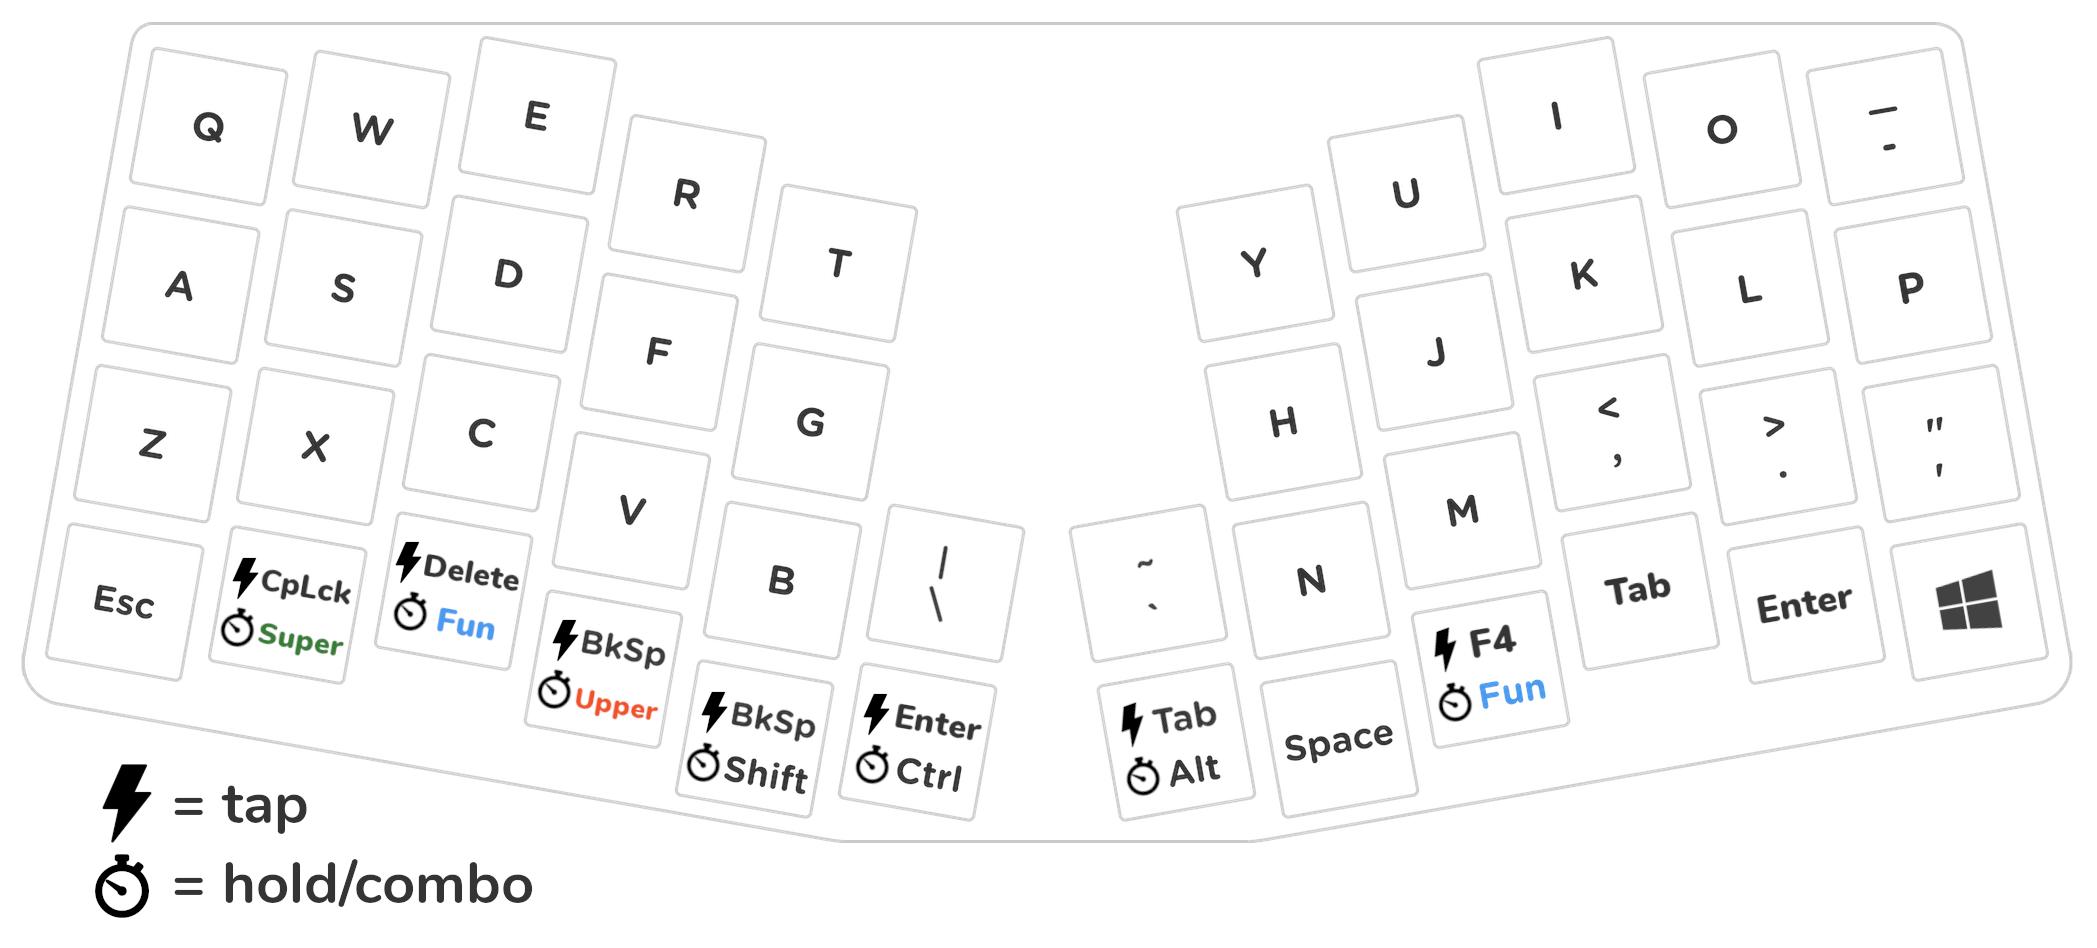 Keyboardio Atreus custom layout, layer 1